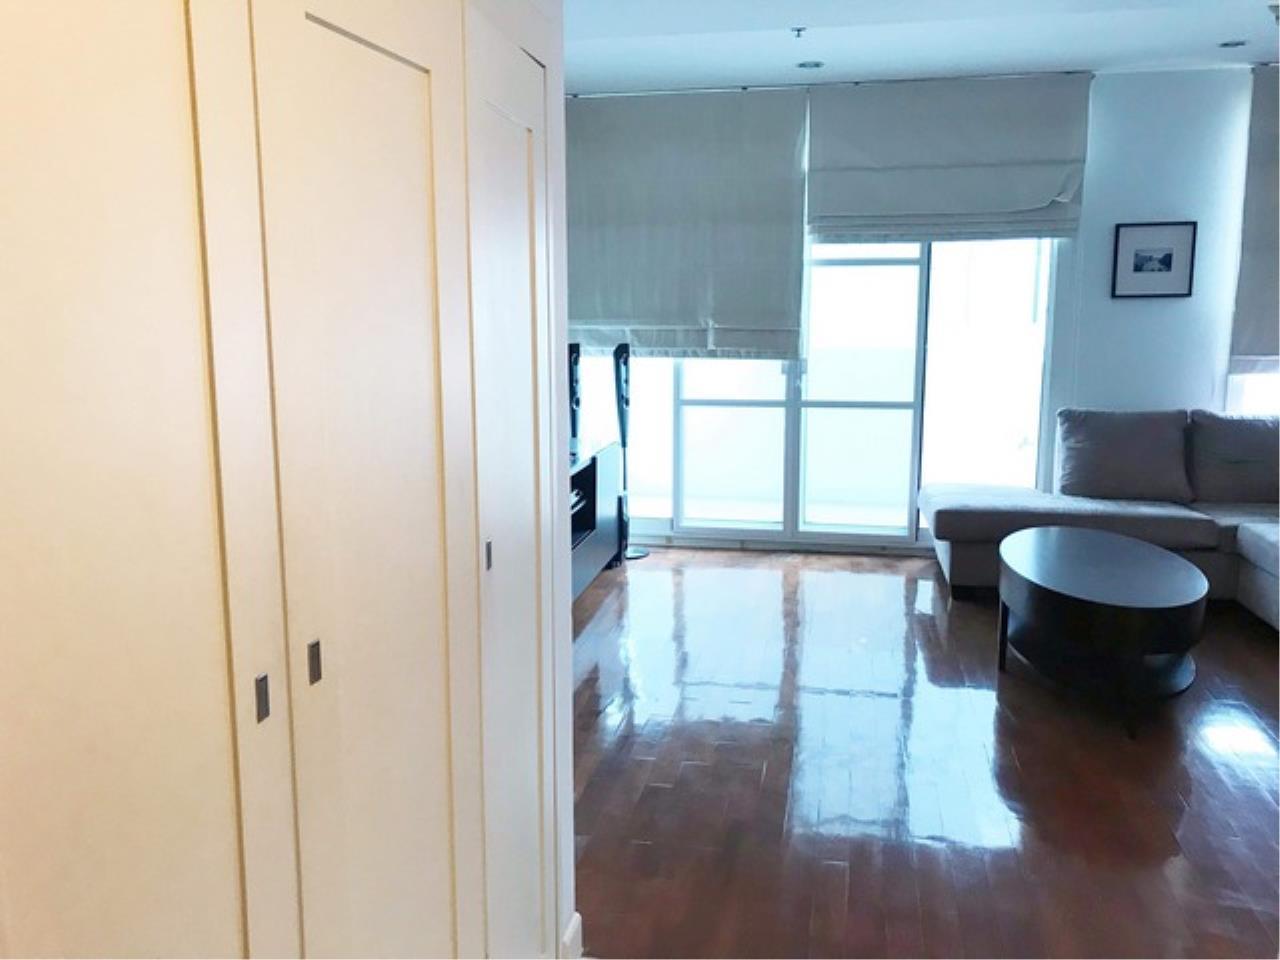 Ta (+66 9 5935 1592) Agency's SALE Condo Siri Residence by Sansiri 2 Bed near BTS Prompong Thonglor Emporium Best Price (163,000B/sqm) 11